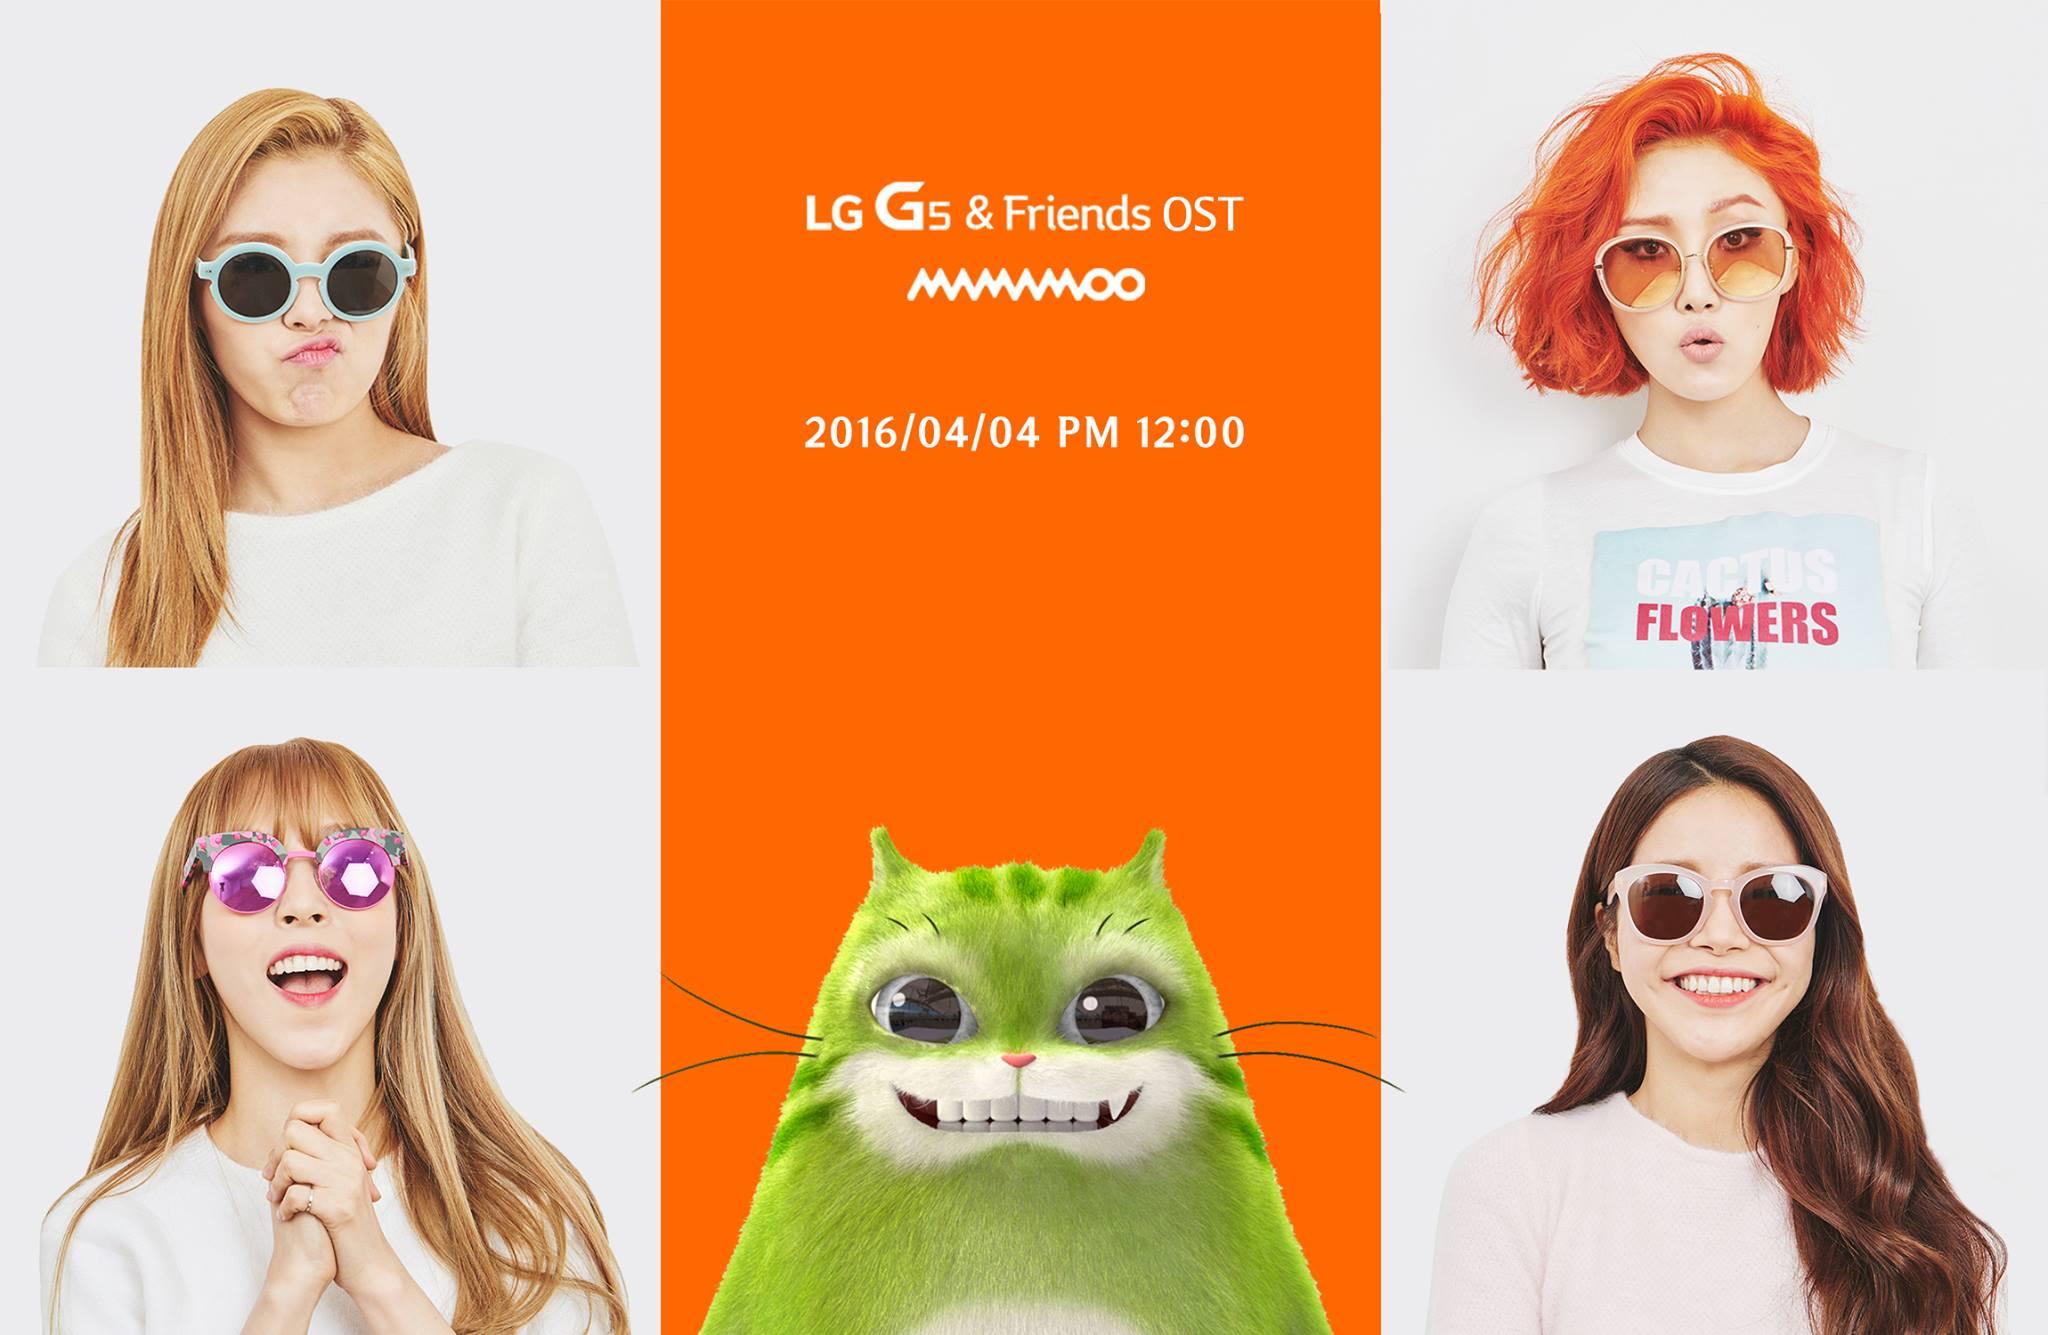 LG G5 & Friends ost 마마무